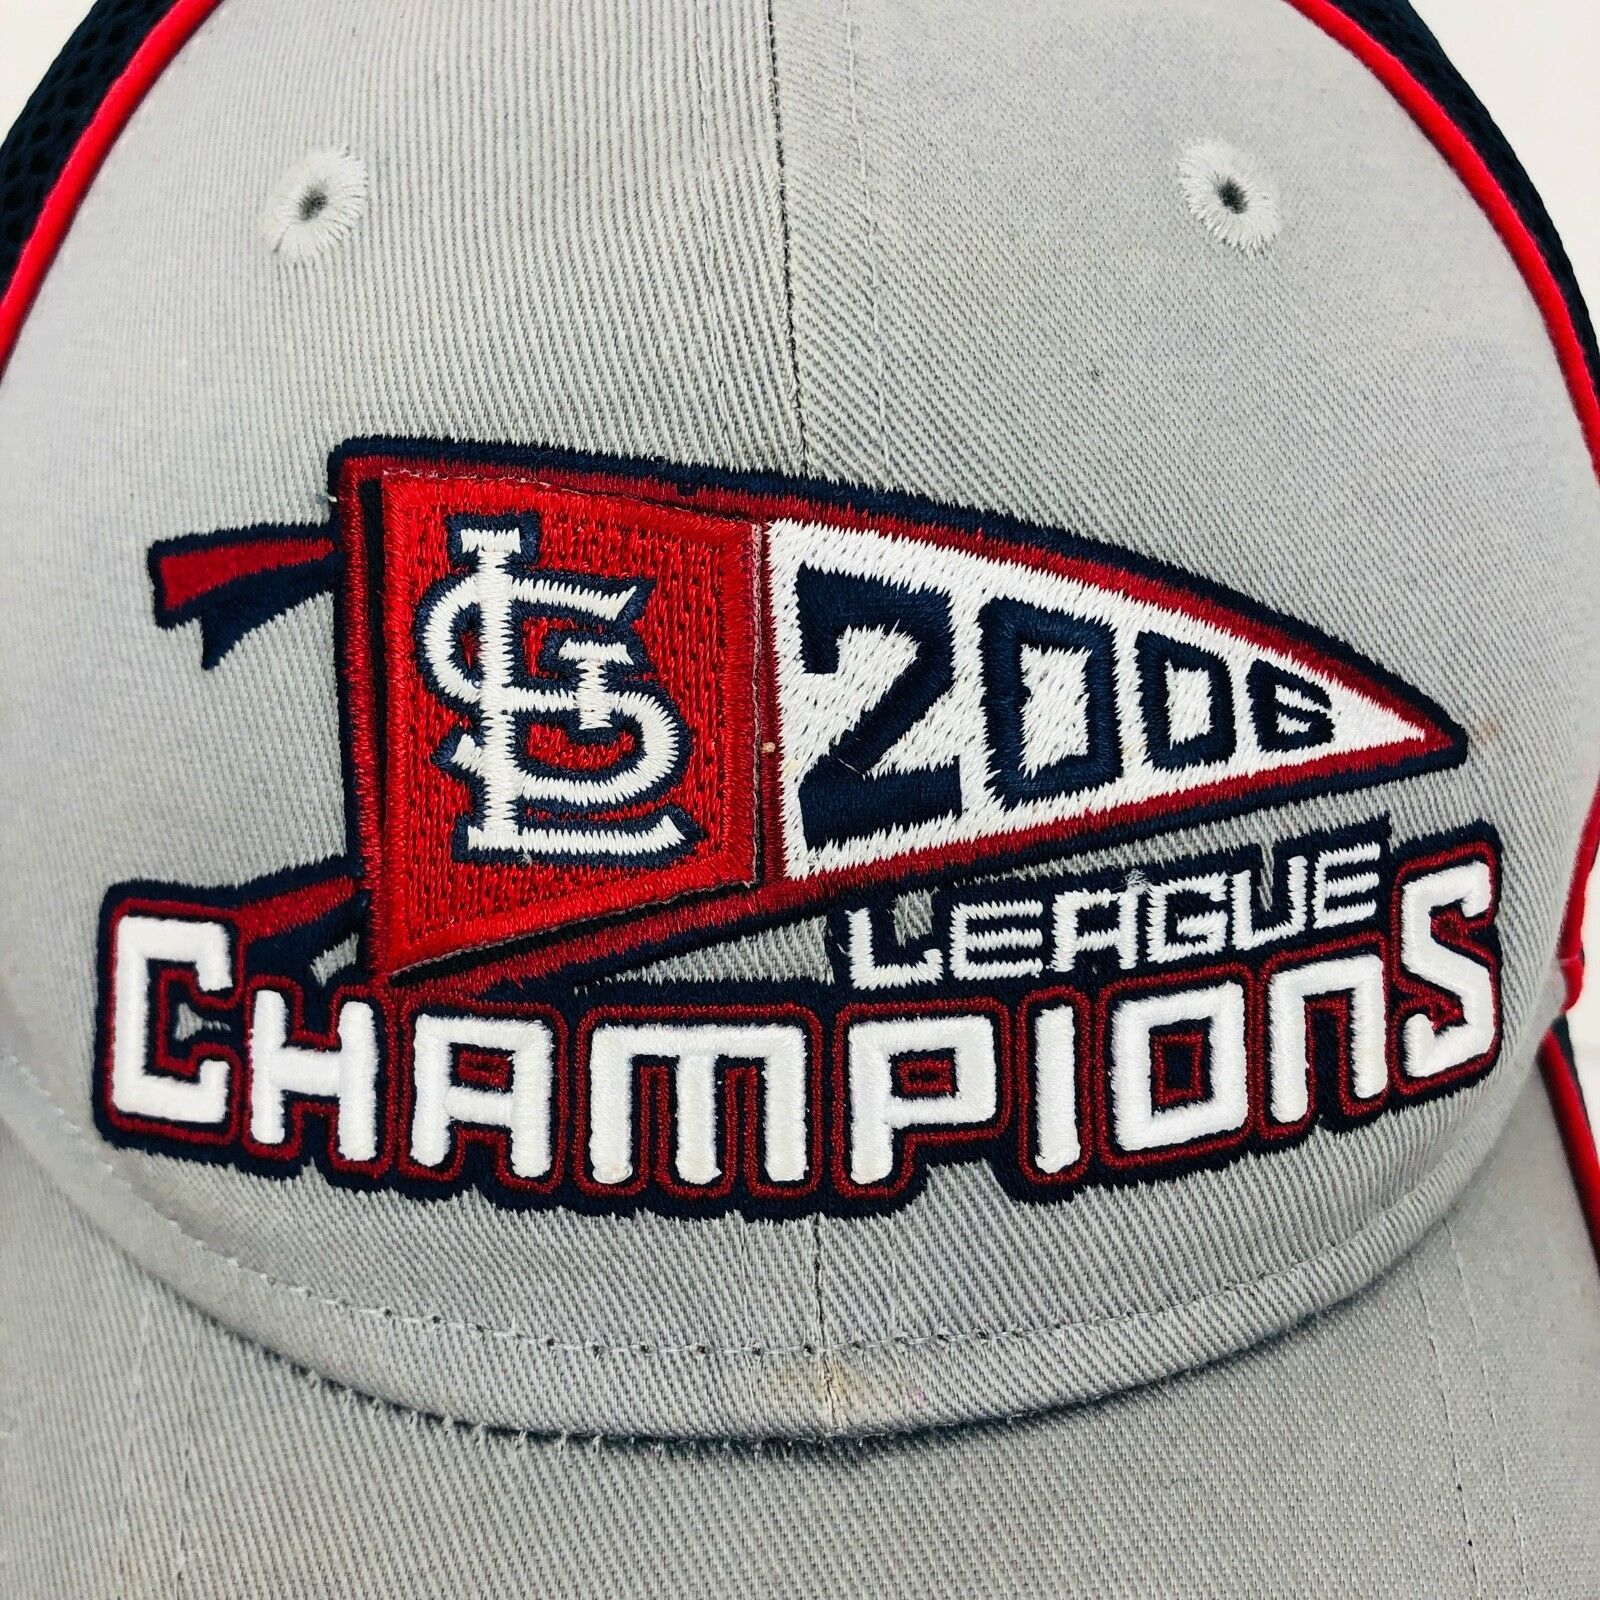 St Lewis Cardinals World Series League Champions 2006 Hat New Era Baseball Cap